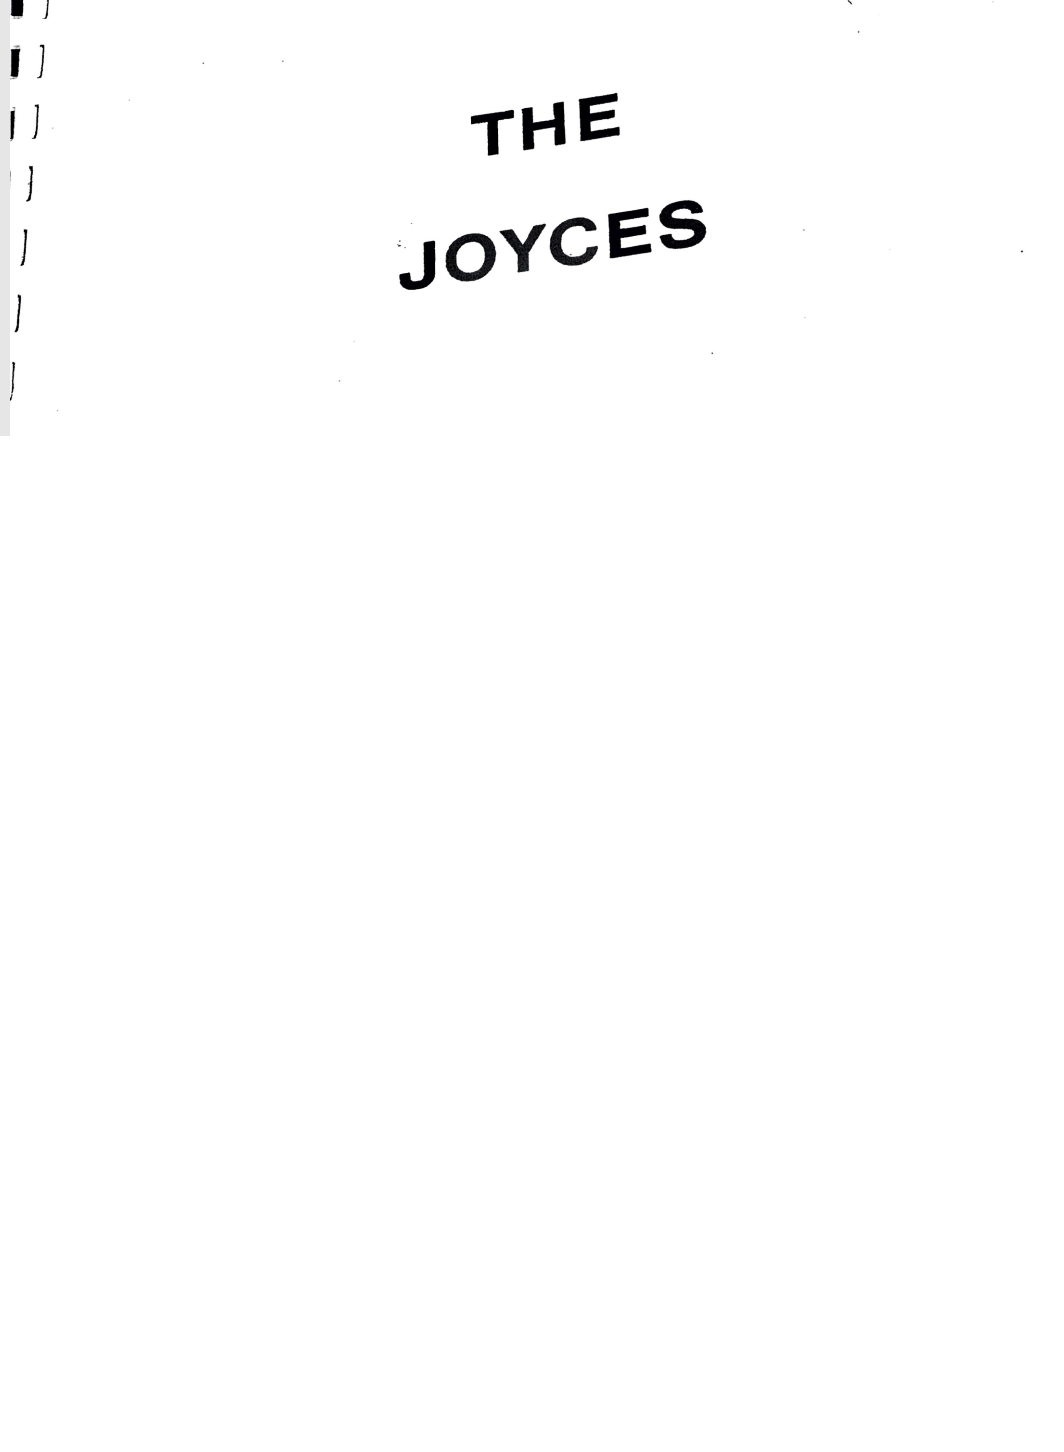 The Joyces